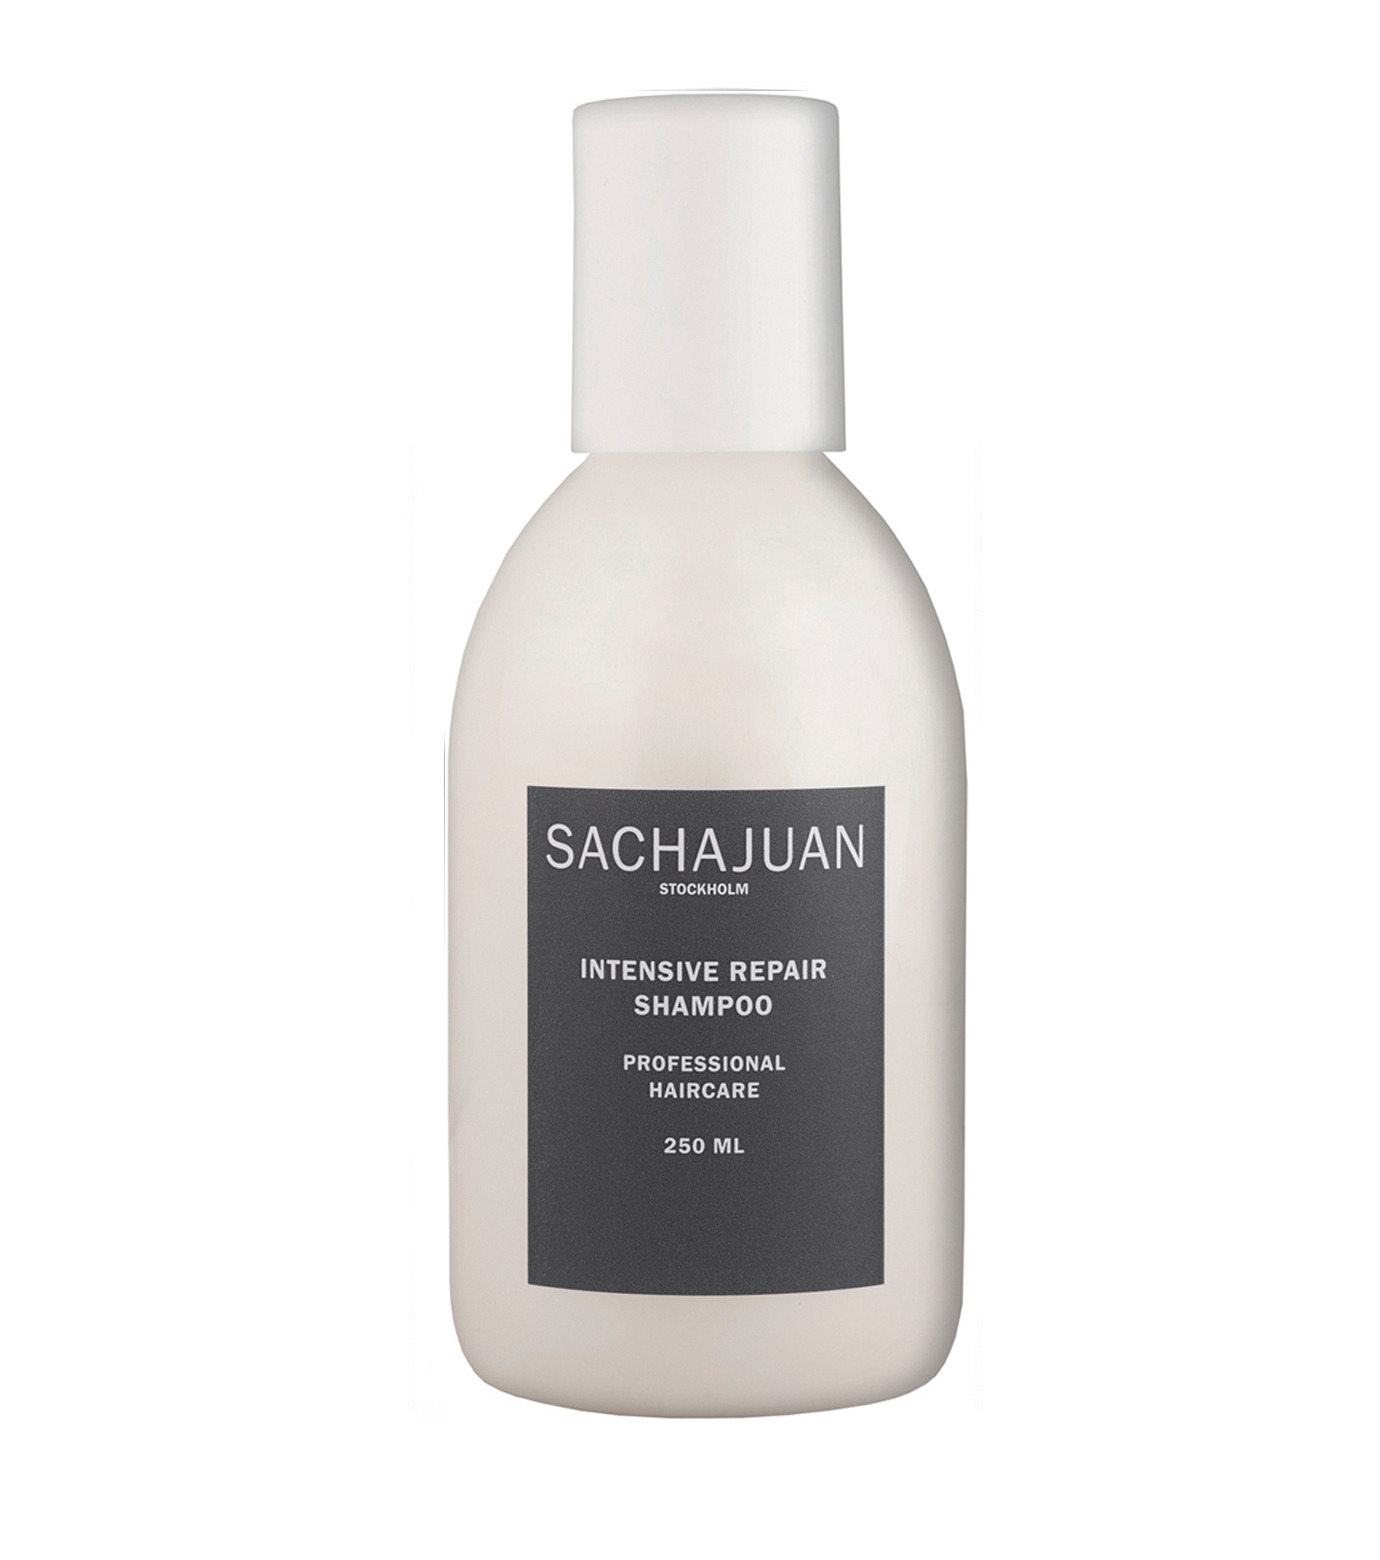 SACHAJUAN(サシャワン)のIntensive Shampoo 250ml-WHITE(HAIR-CARE/HAIR-CARE)-157-4 拡大詳細画像1